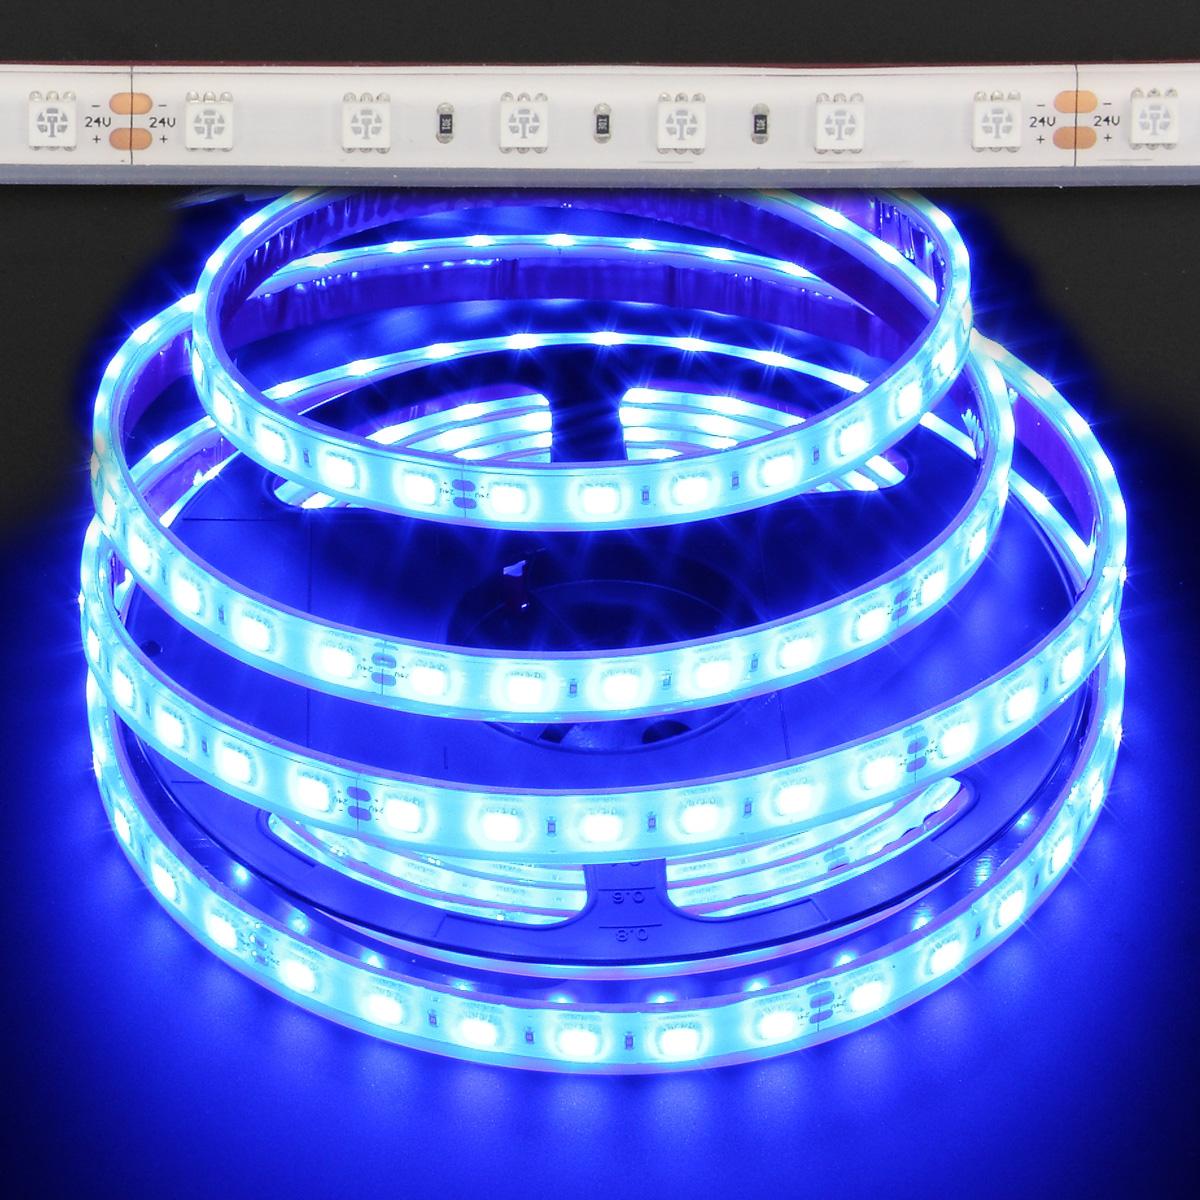 led strip lights waterproof led strip blue waterproof led strip light. Black Bedroom Furniture Sets. Home Design Ideas